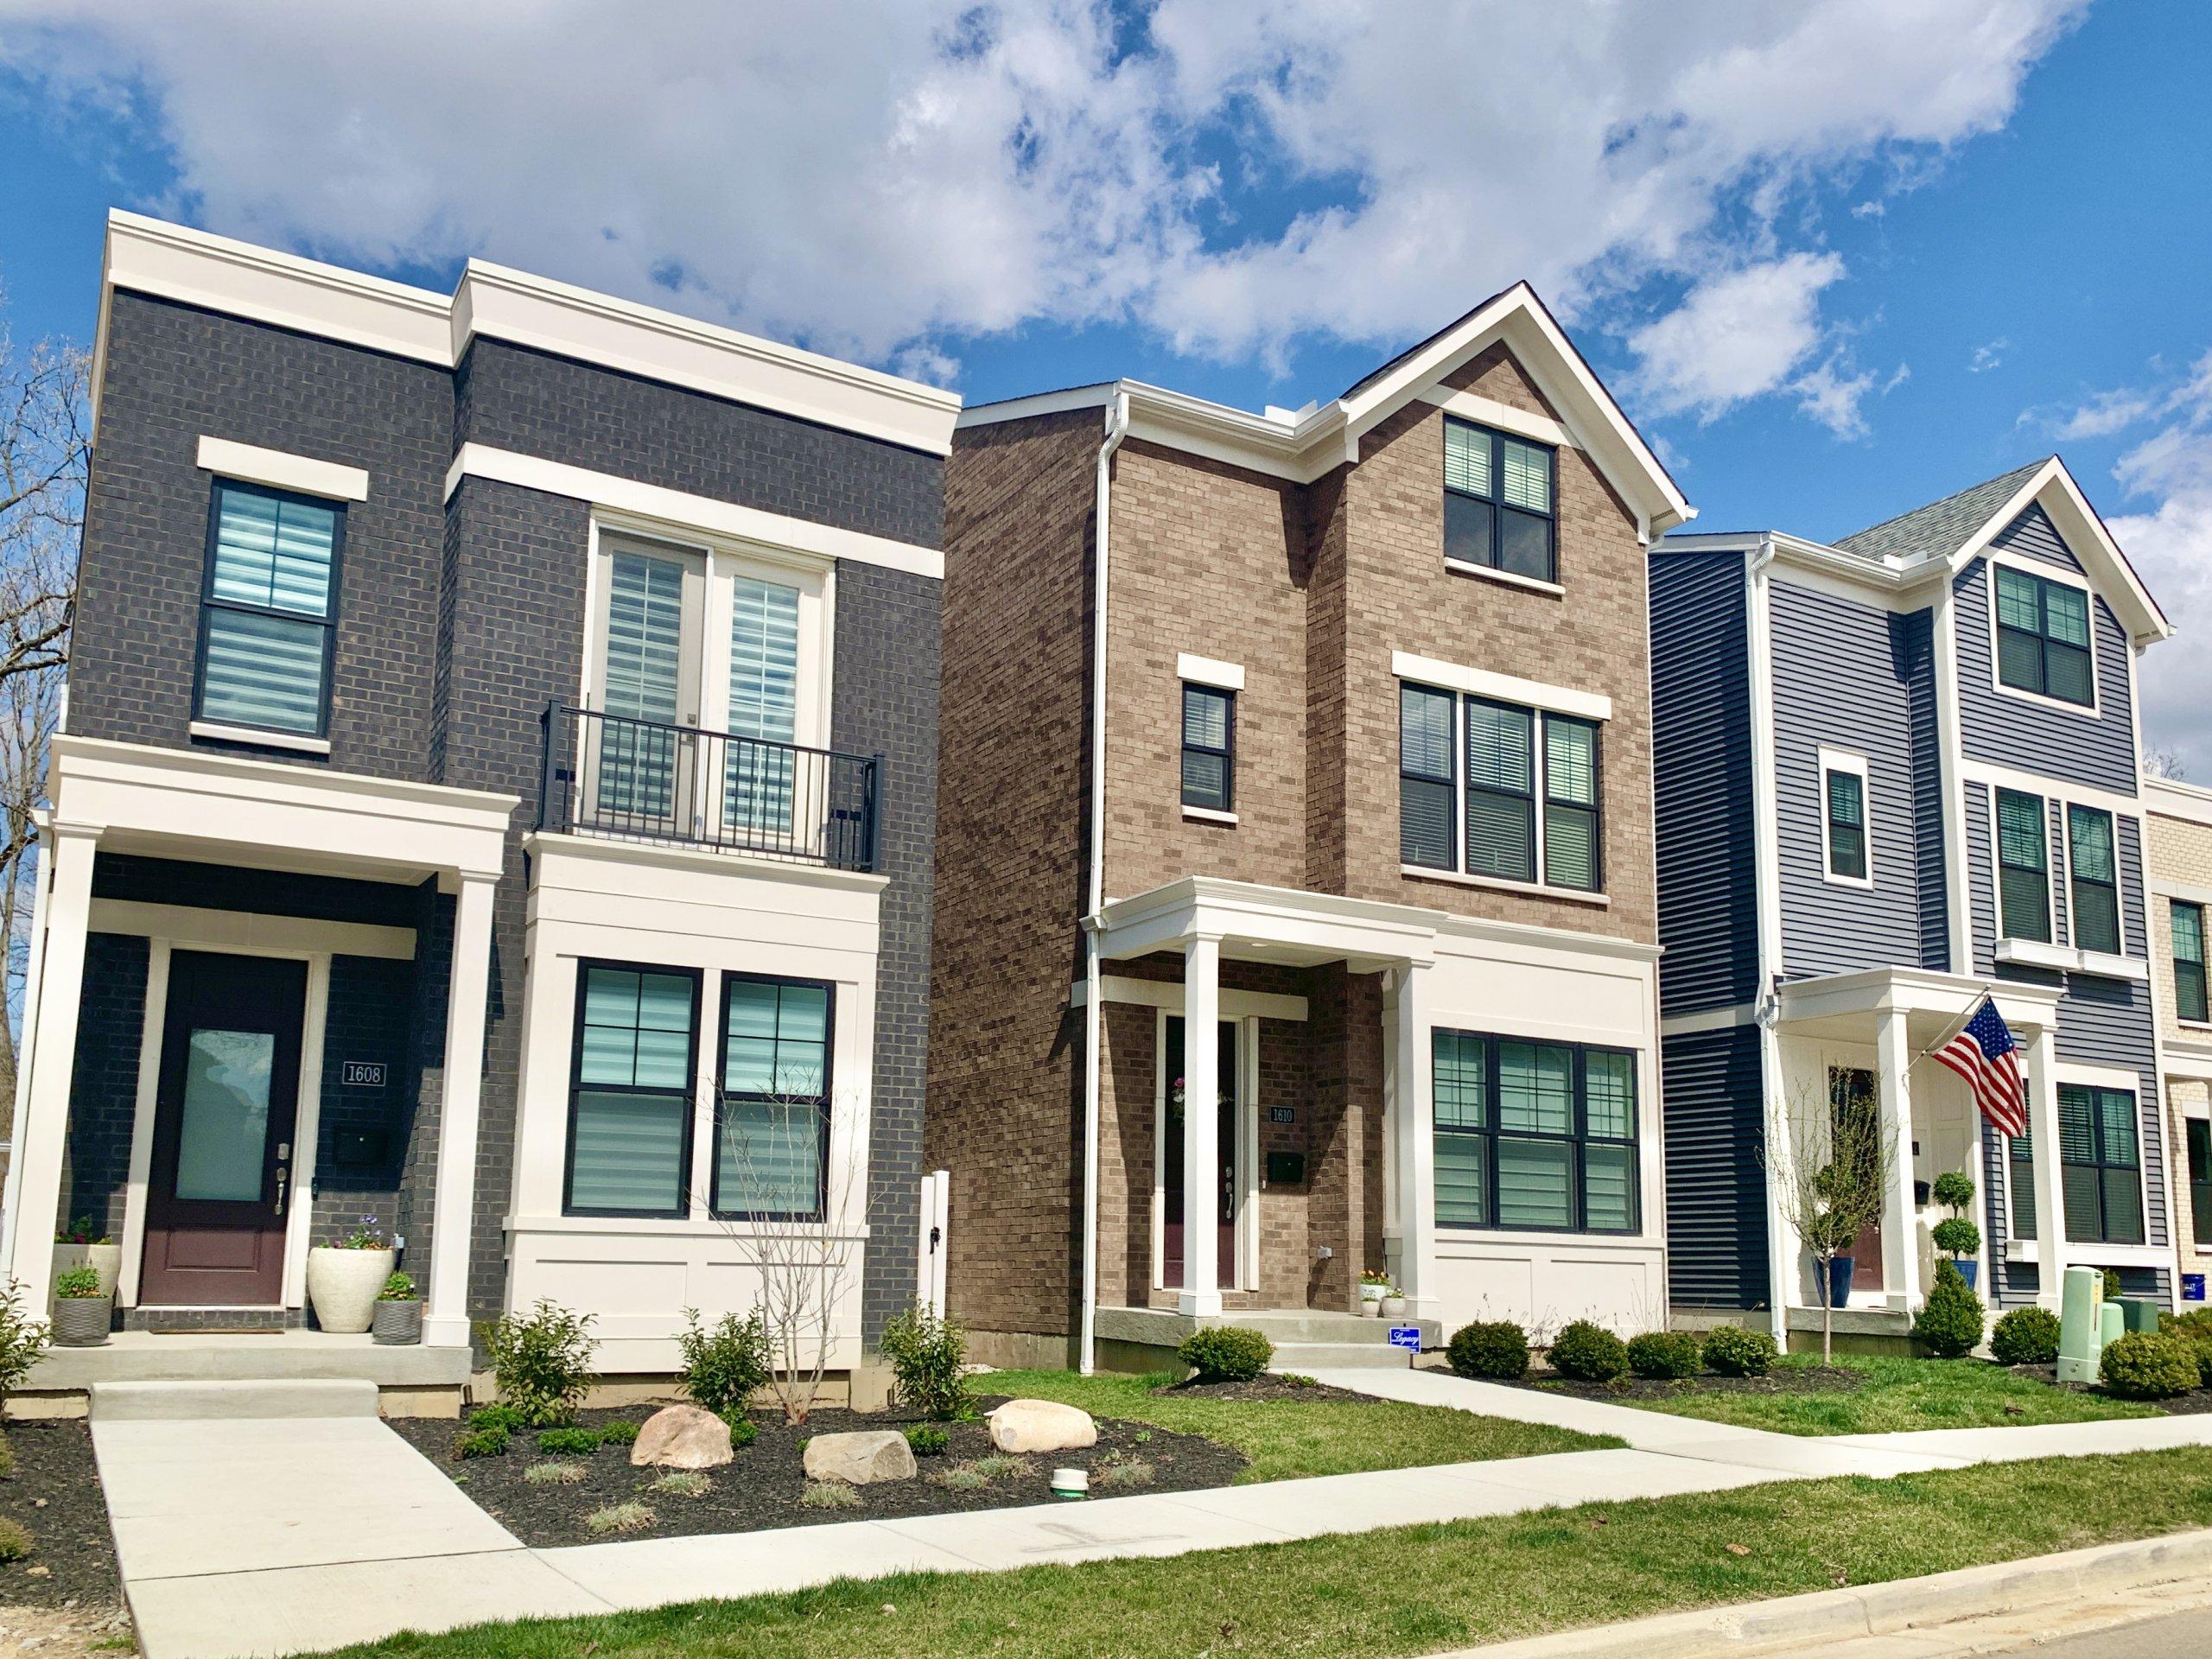 New Development in Evanston